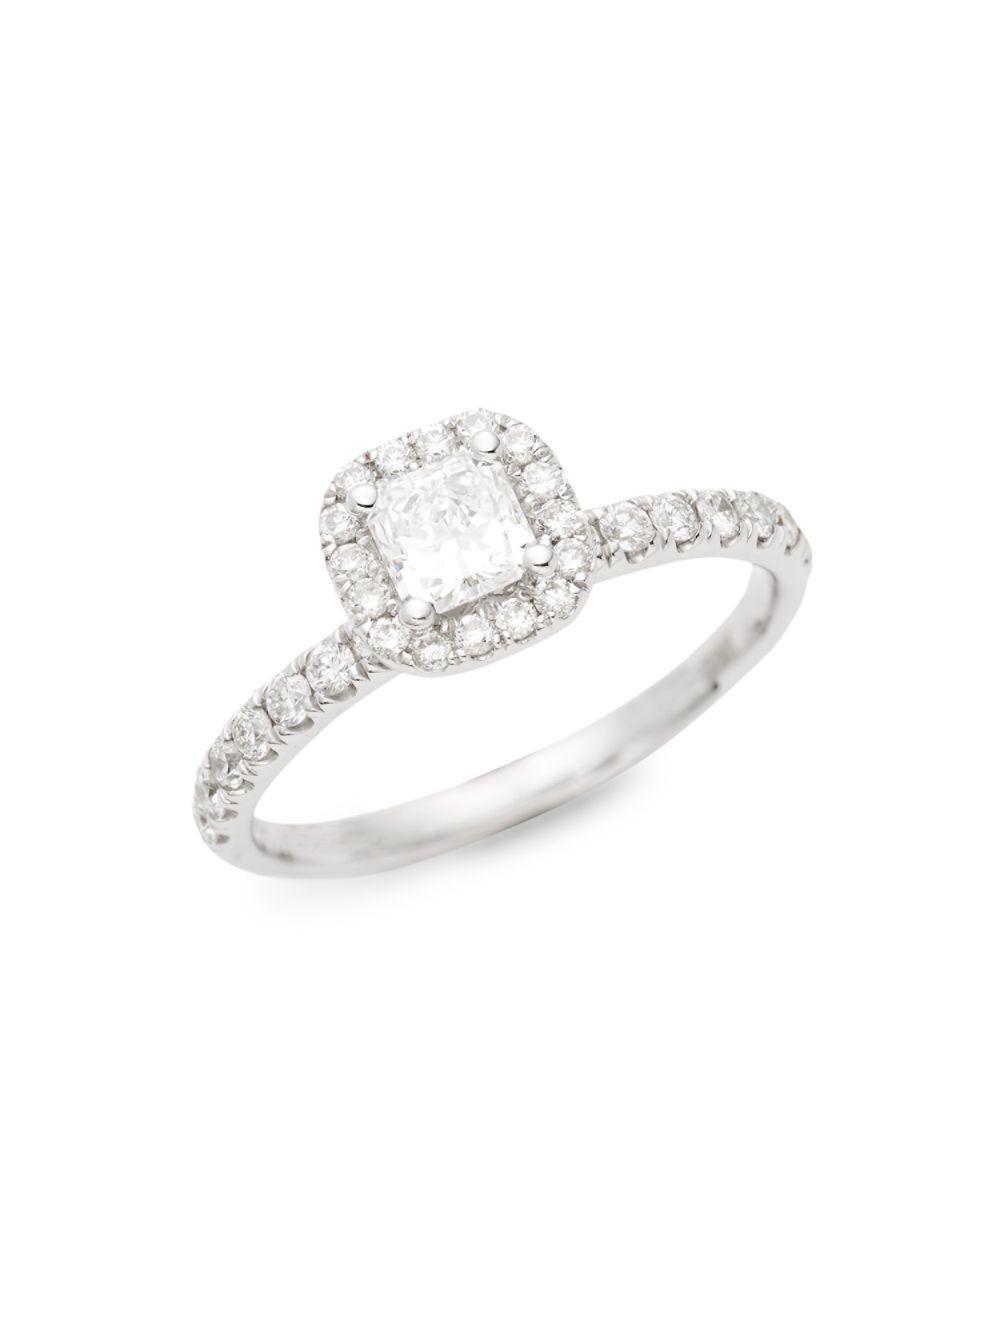 aba2ca2a70f66 Lyst - Saks Fifth Avenue 18k White Gold & Diamond Ring in Metallic